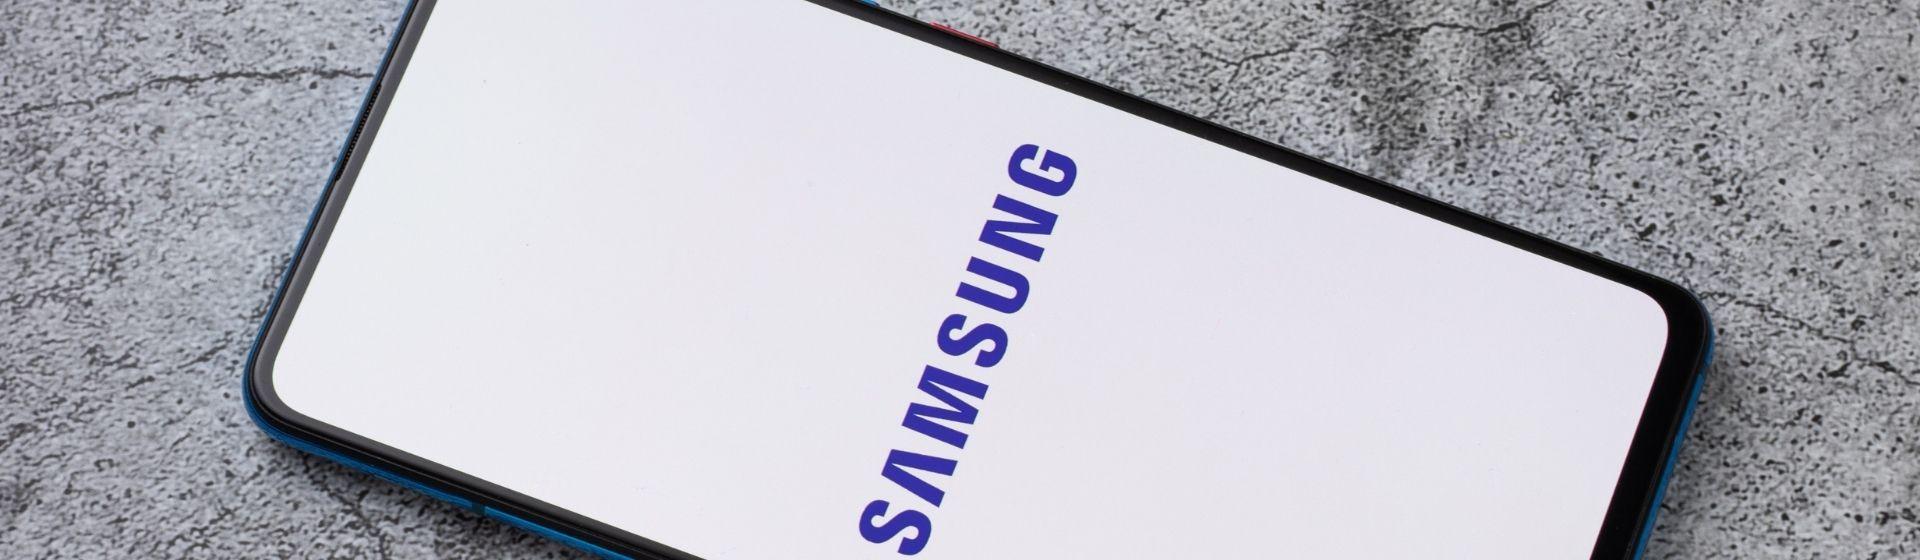 Como remover a conta Samsung Account do celular